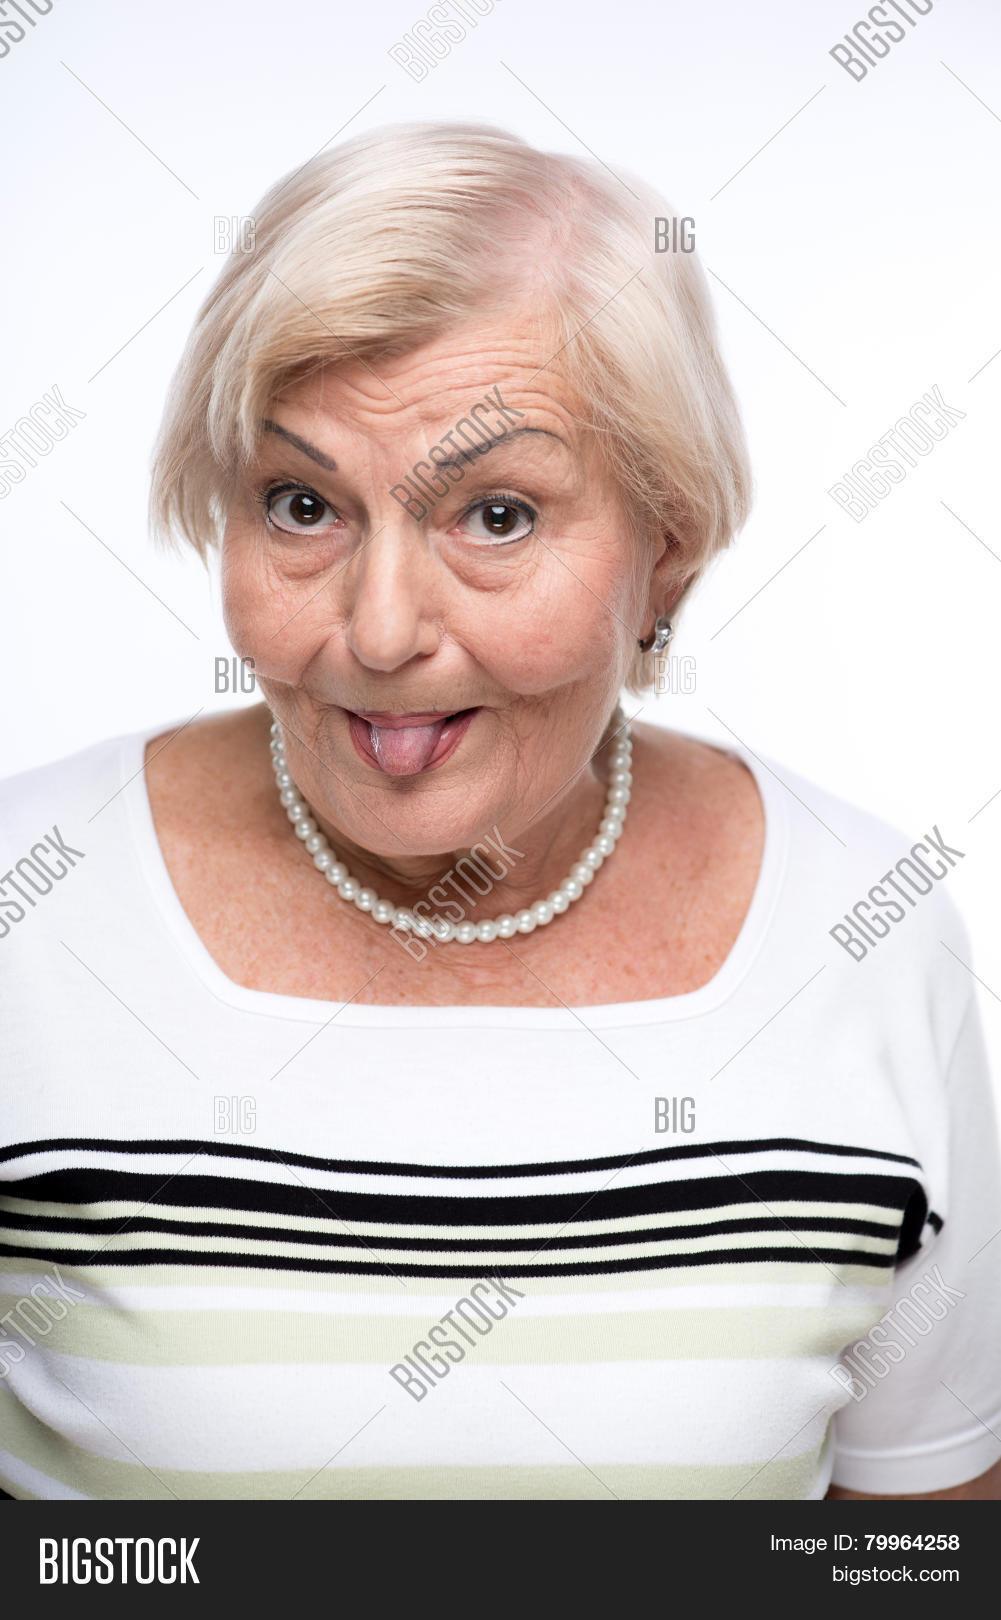 naughty granny making faces image & photo | bigstock